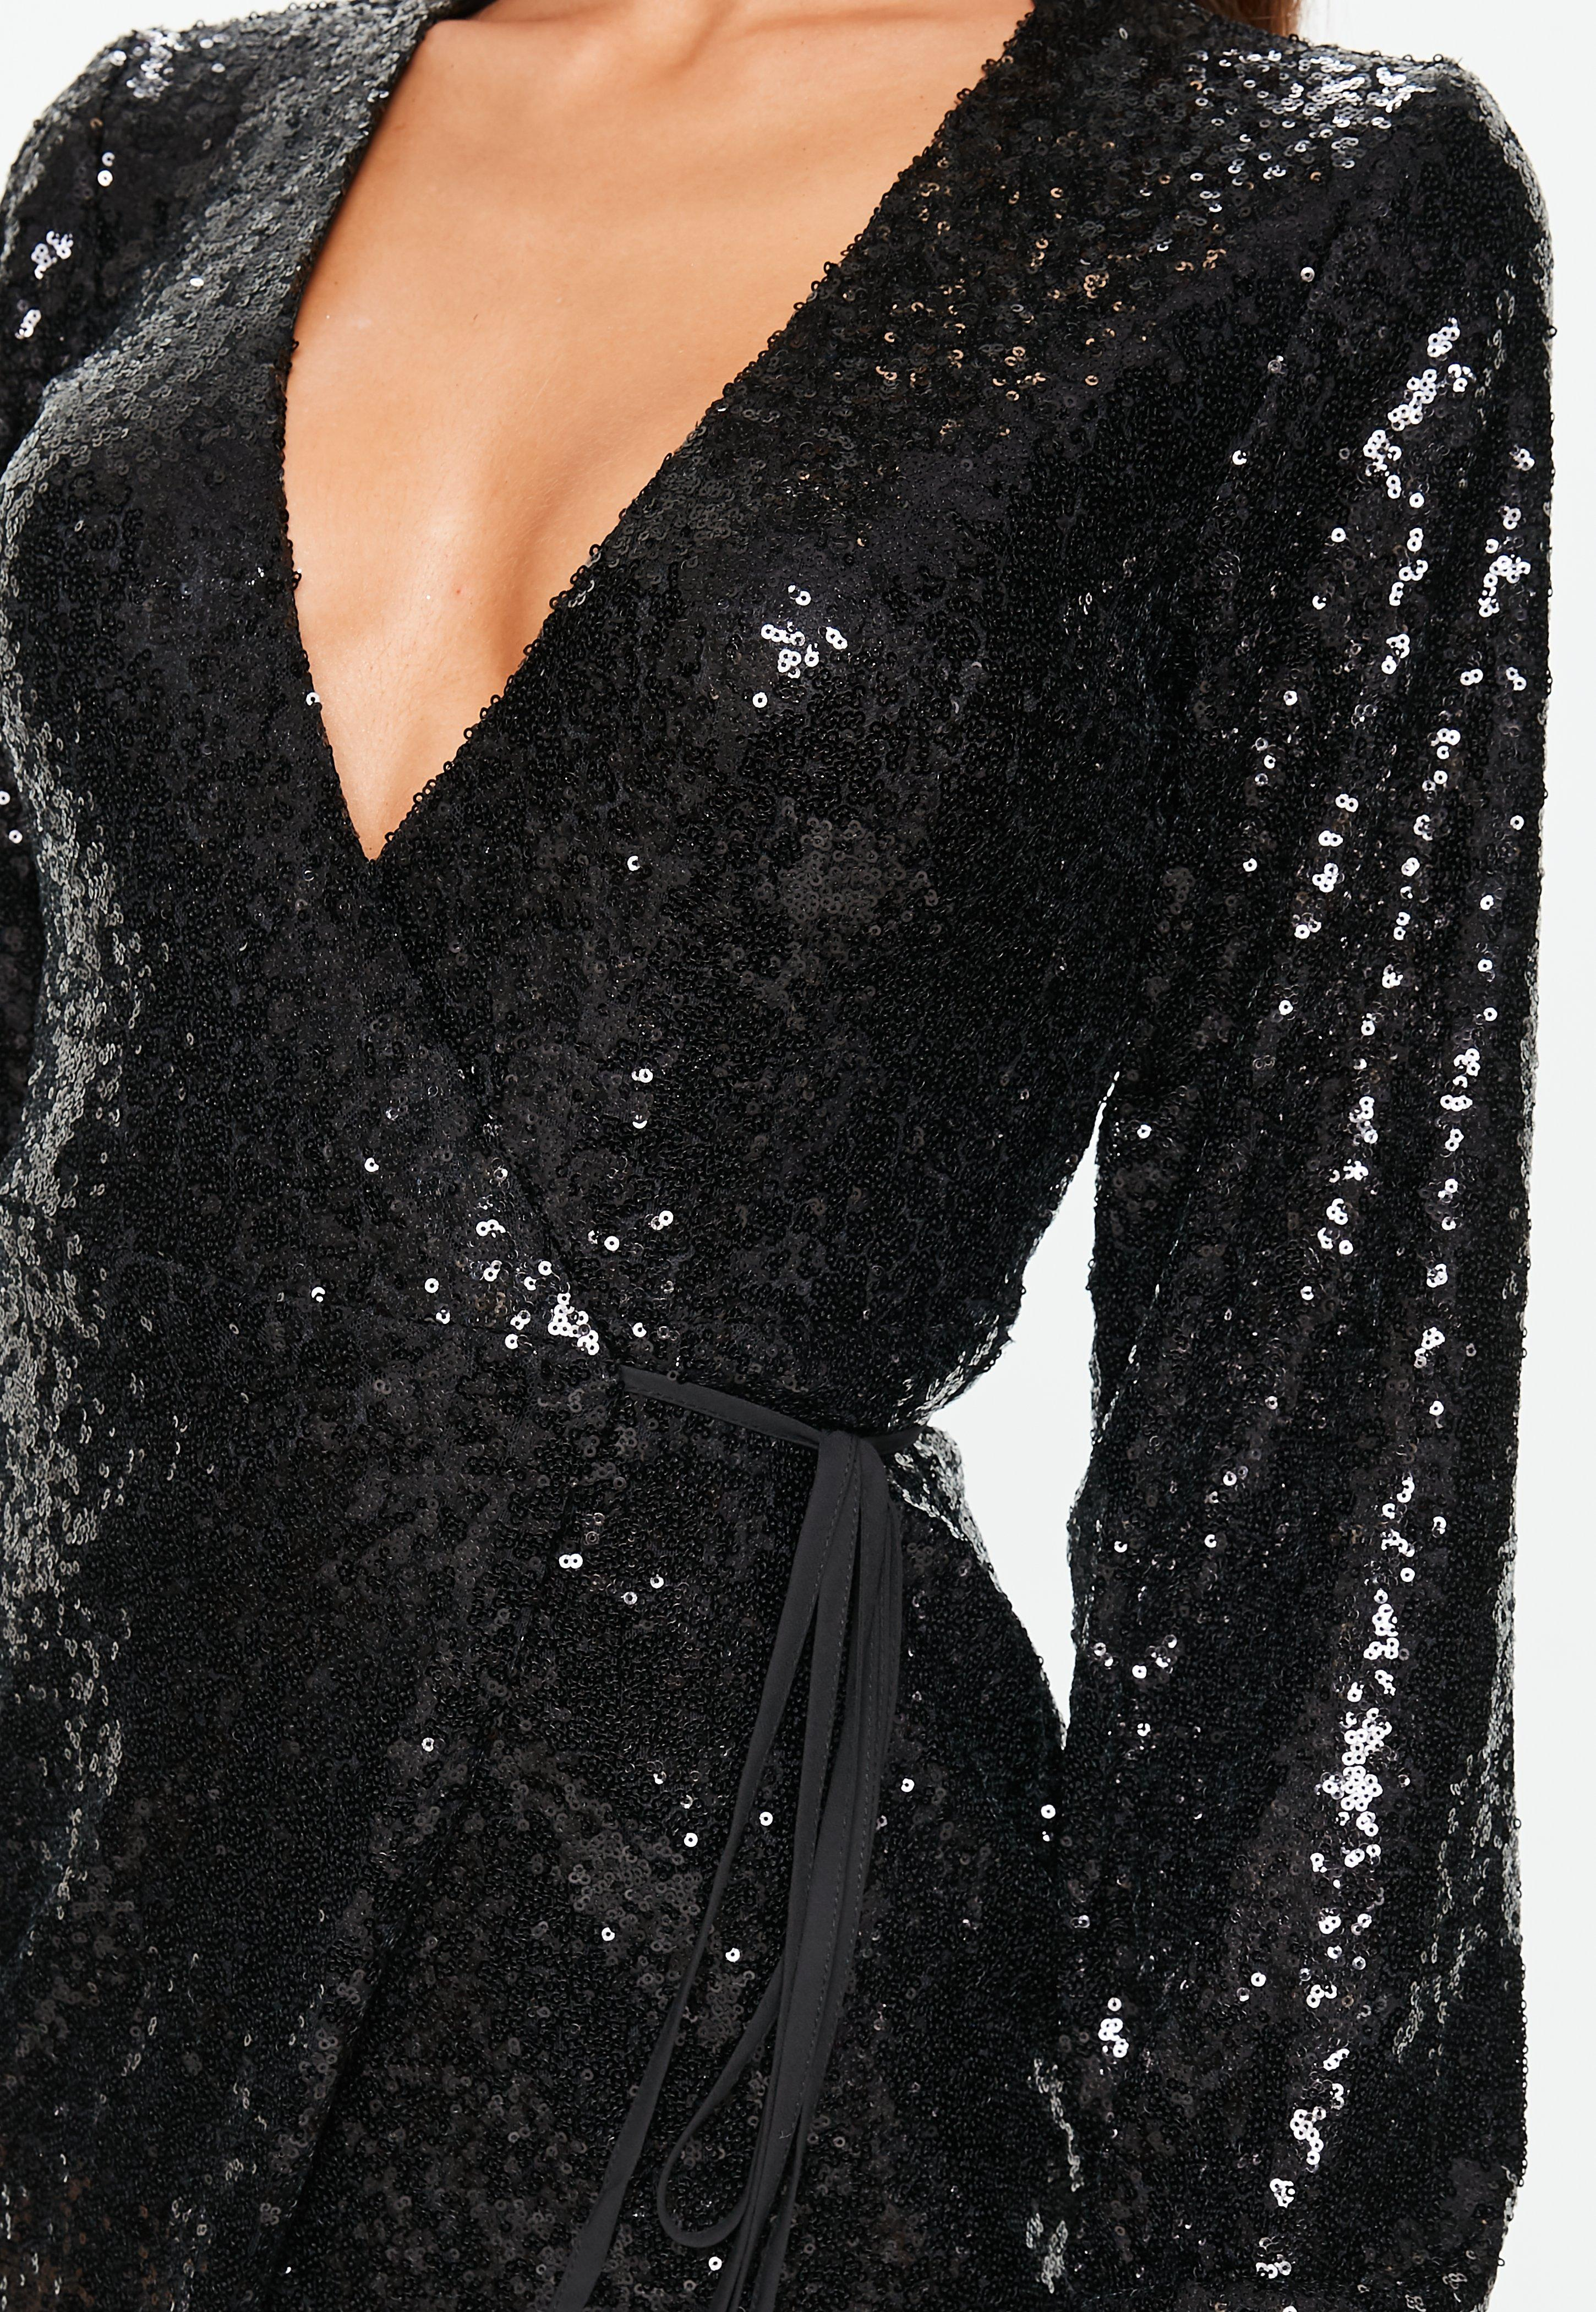 0e53e1d9 Missguided - Black Sequin Wrap Mini Dress - Lyst. View fullscreen